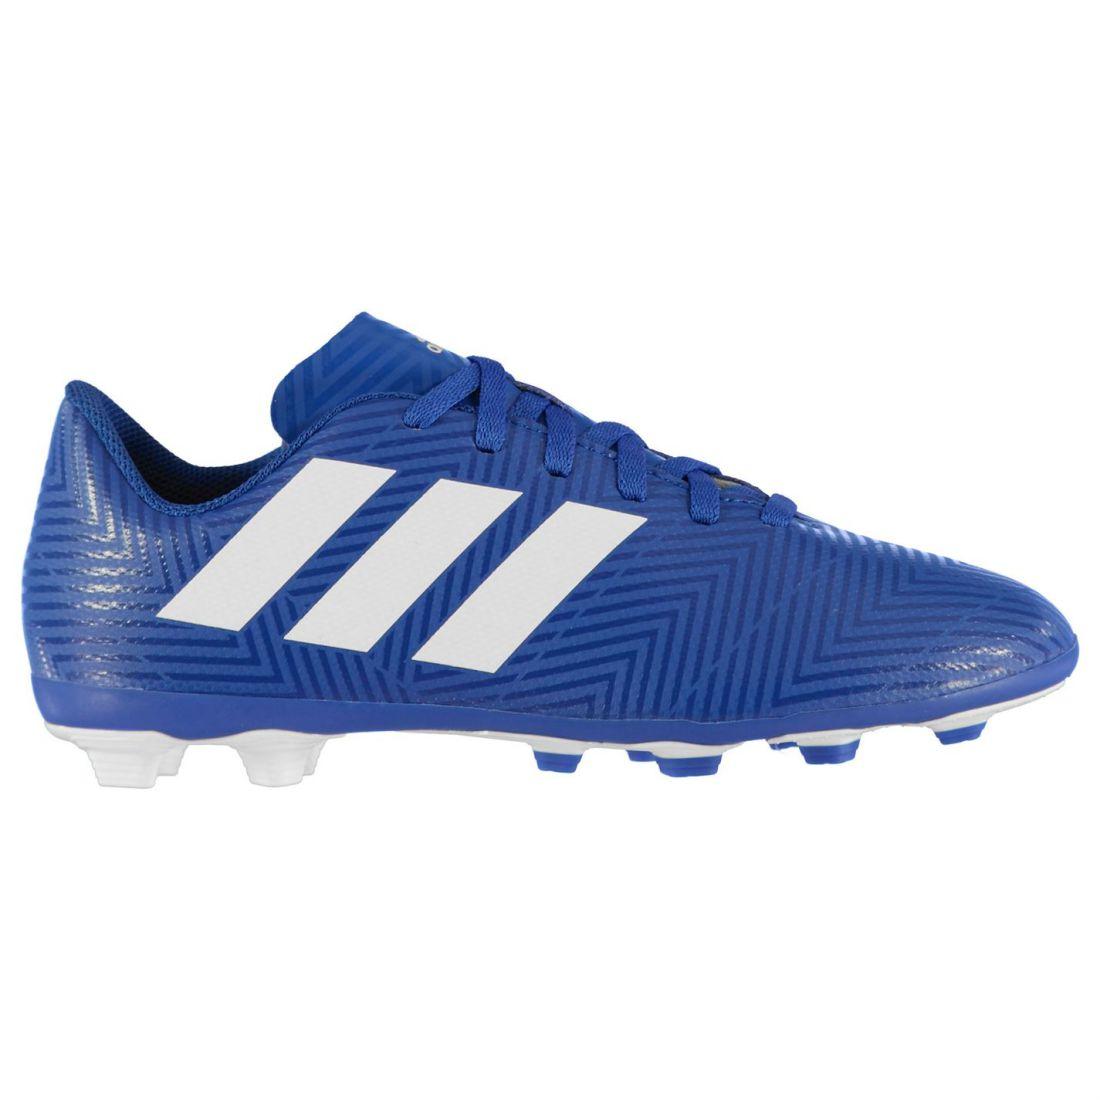 9fbb9ef4c Adidas Kids Boys Nemeziz 18.4 FG Child Football Boots Firm Ground Lace Up  Studs